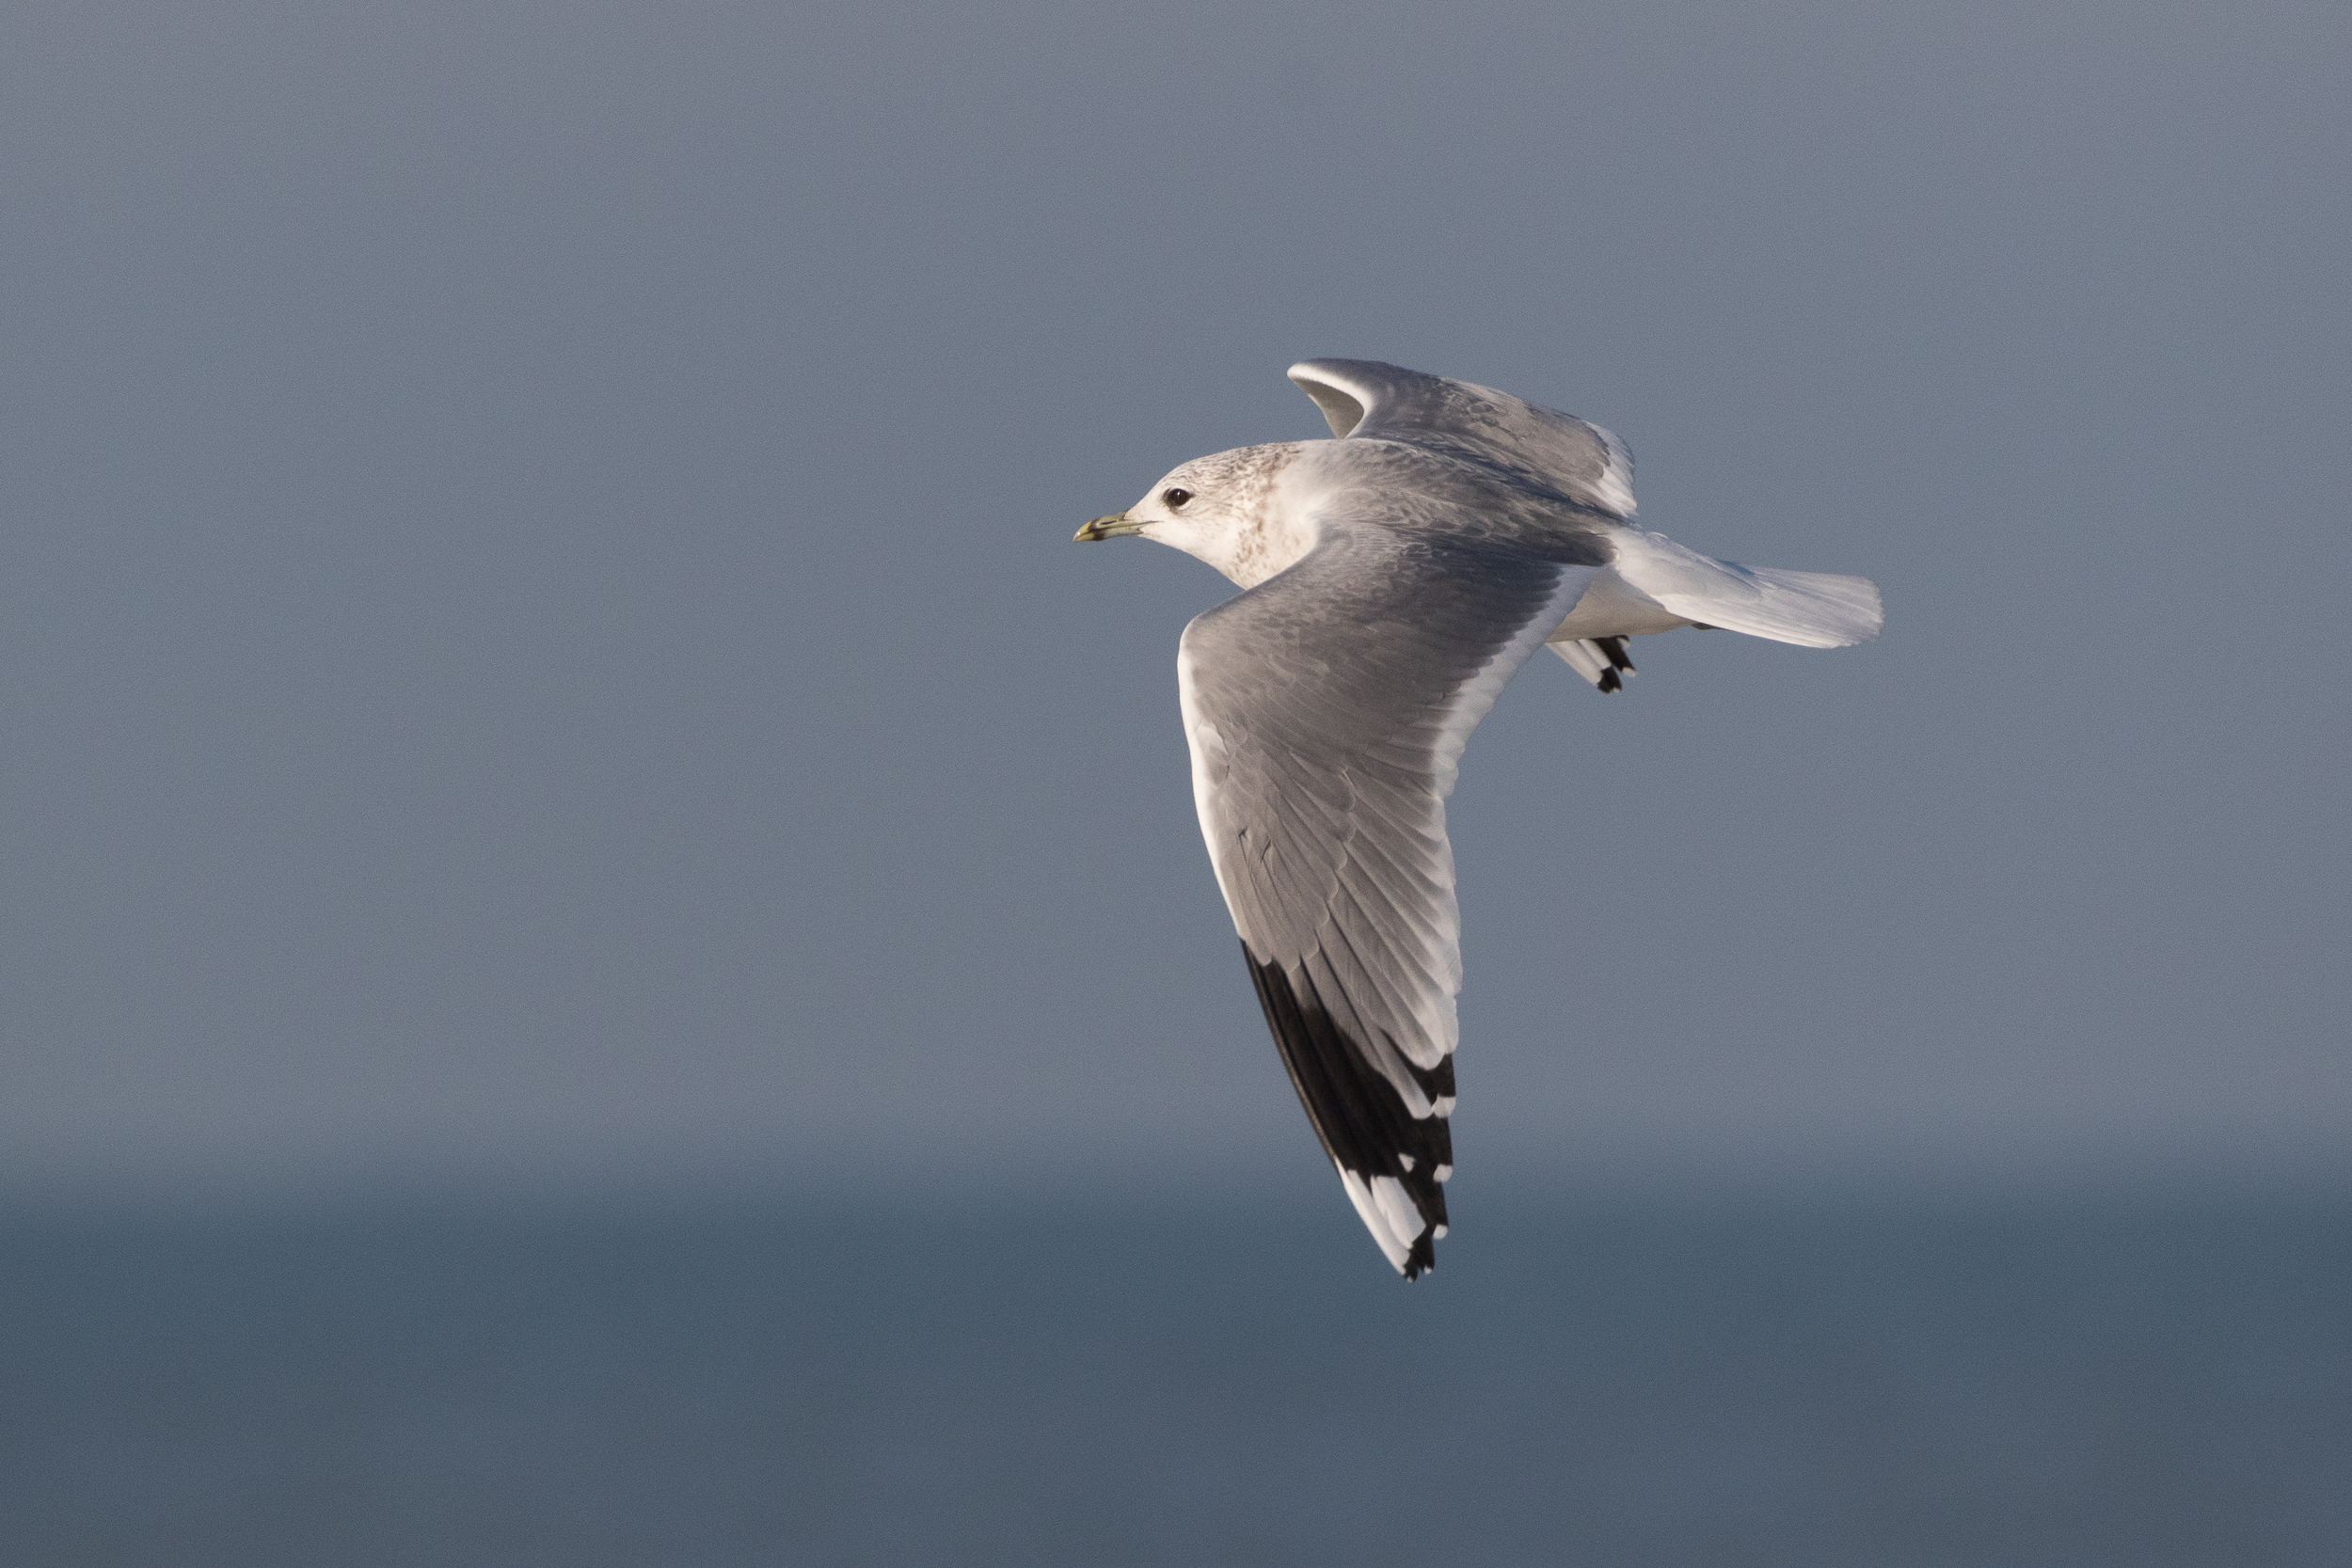 20170121-Common Gull Adult-102.jpg